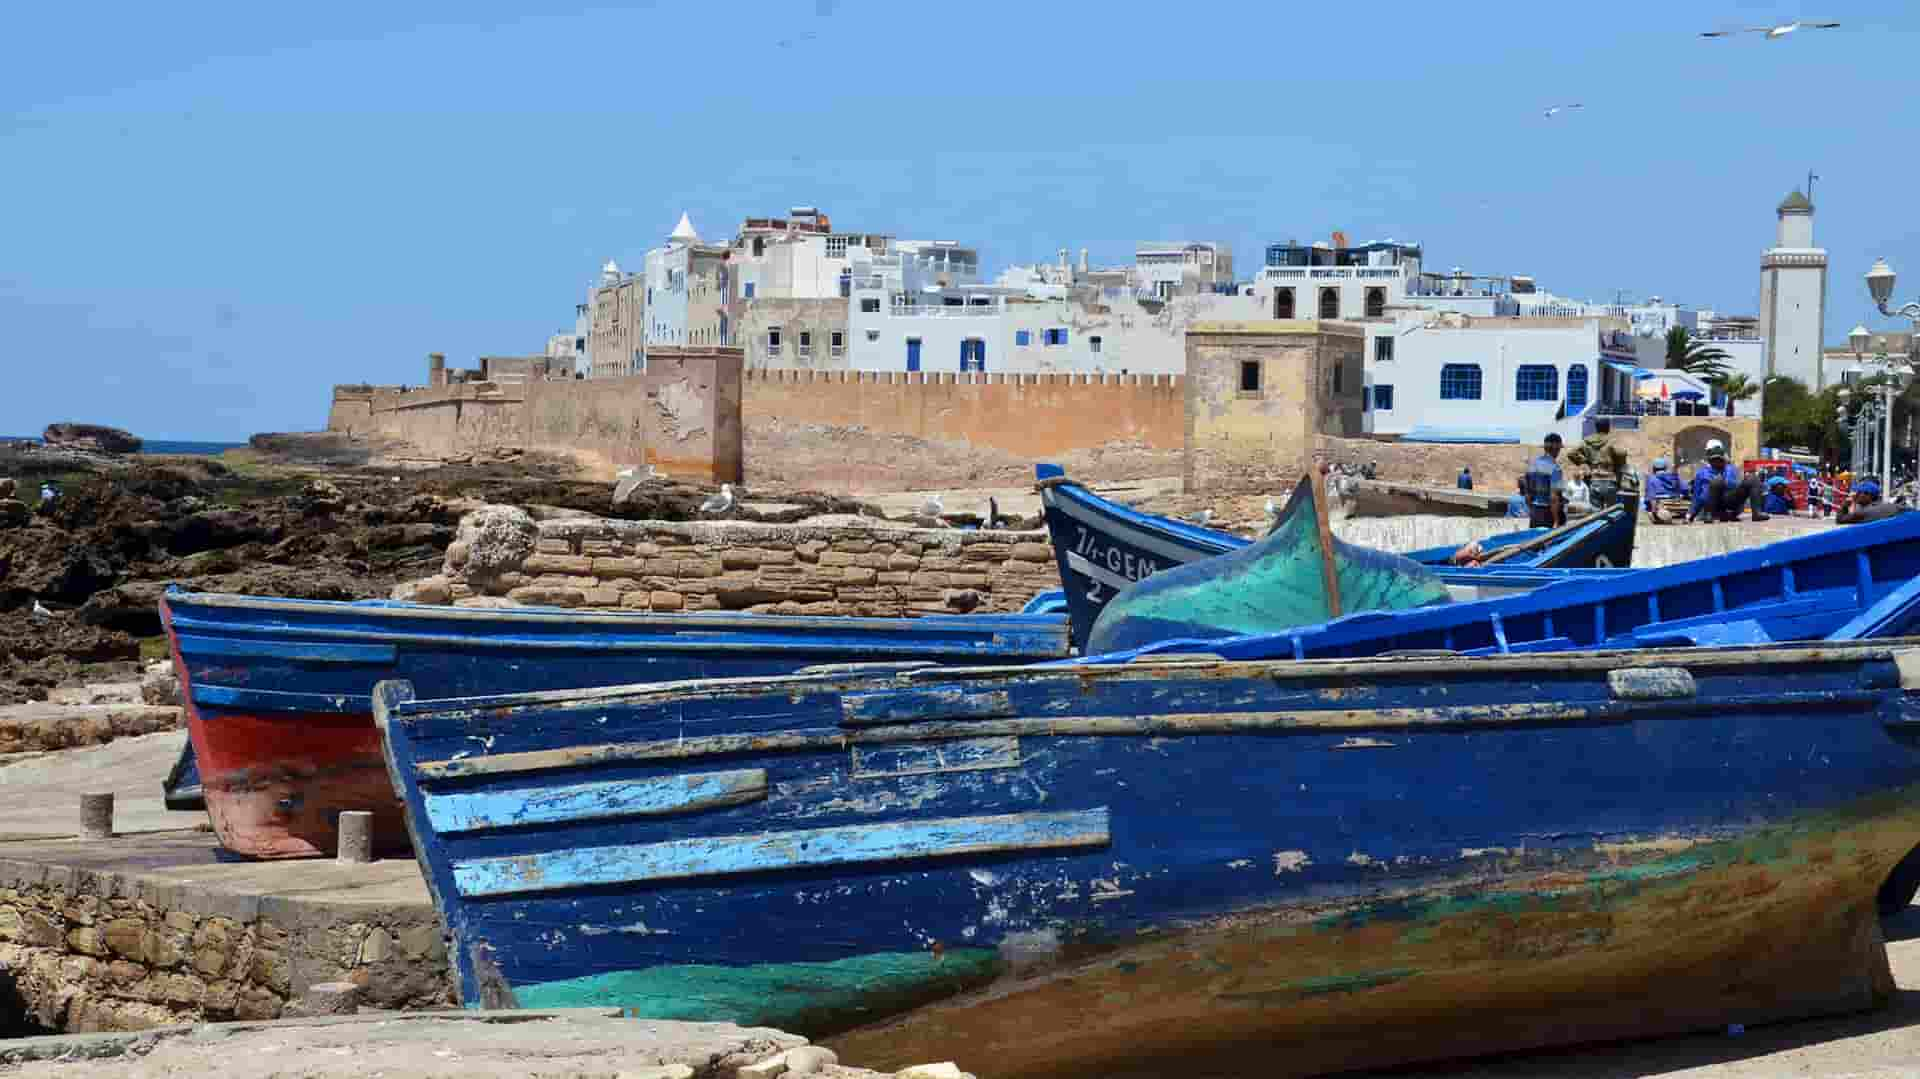 Port de pêche essaouira